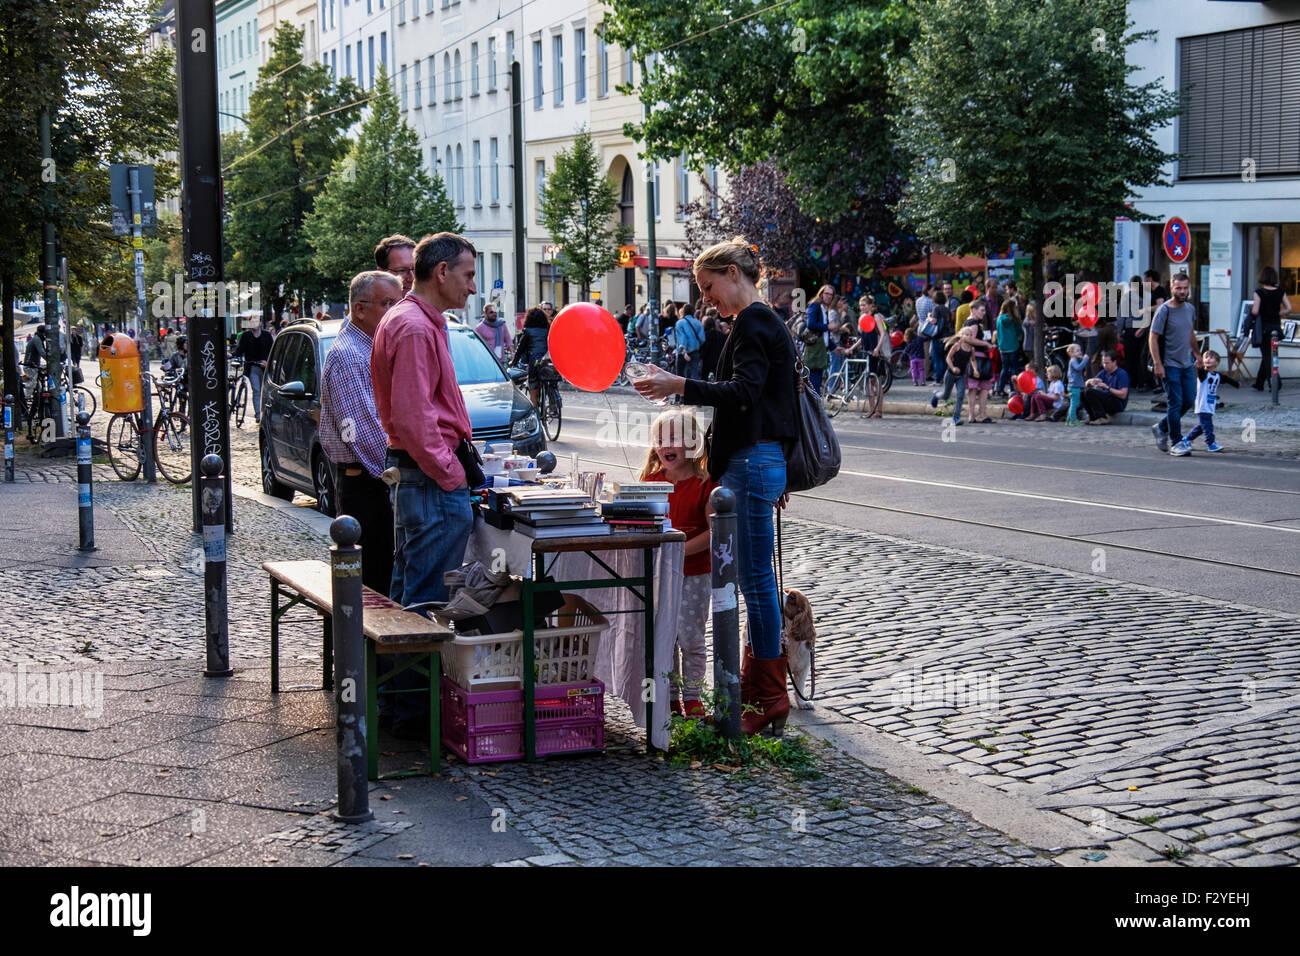 Berlin Veteranenstrasse Street Party - Veteran Street Fest - woman and child shop at fleamarket stall in traffic - Stock Image